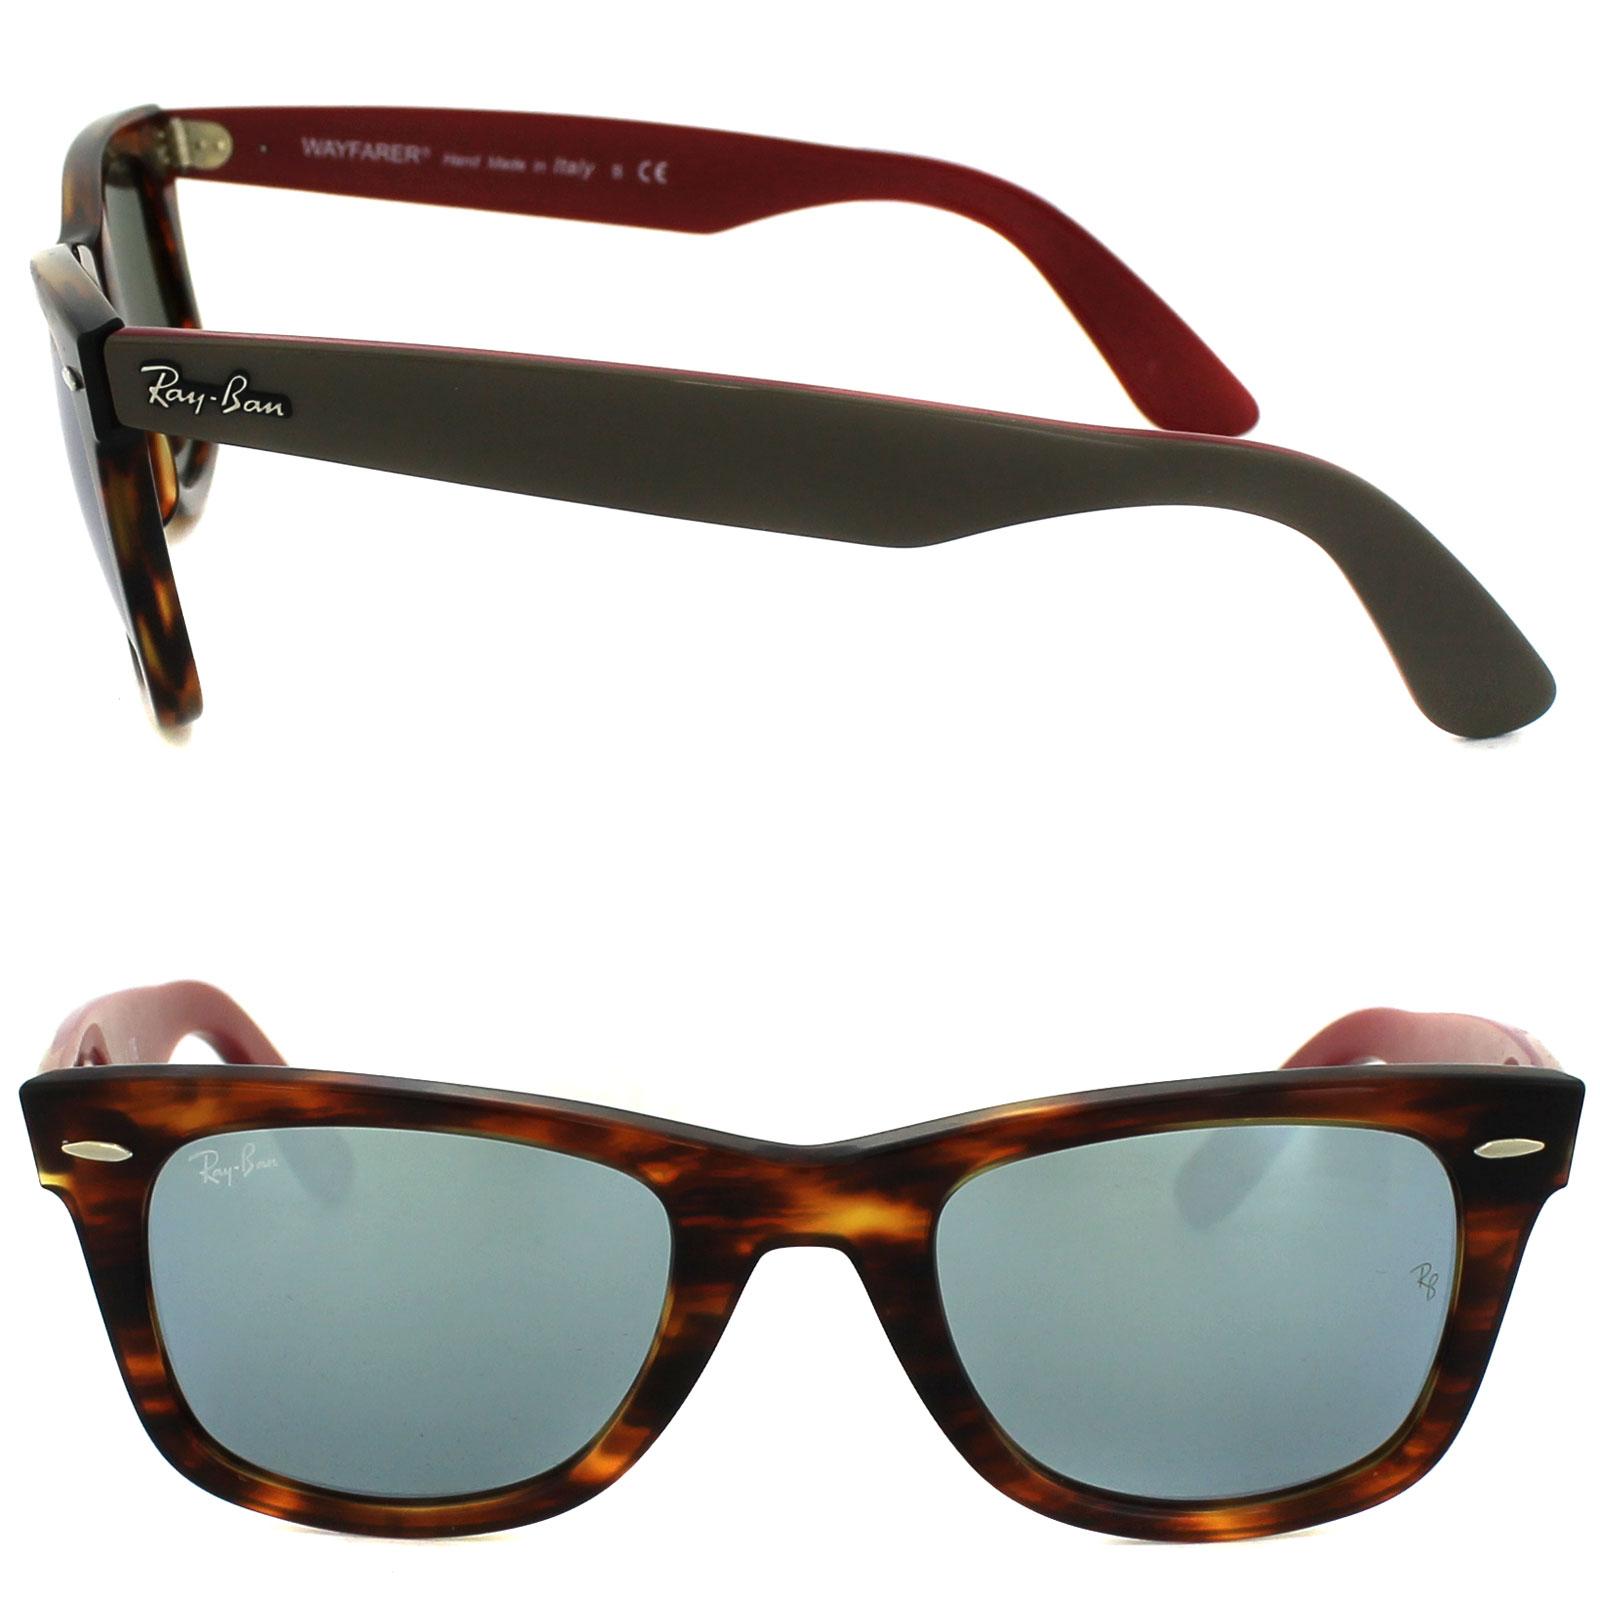 cba2c6185e Sentinel Ray-Ban Sunglasses Wayfarer 2140 117830 Bicolor Tortoise Grey    Purple Mirror L